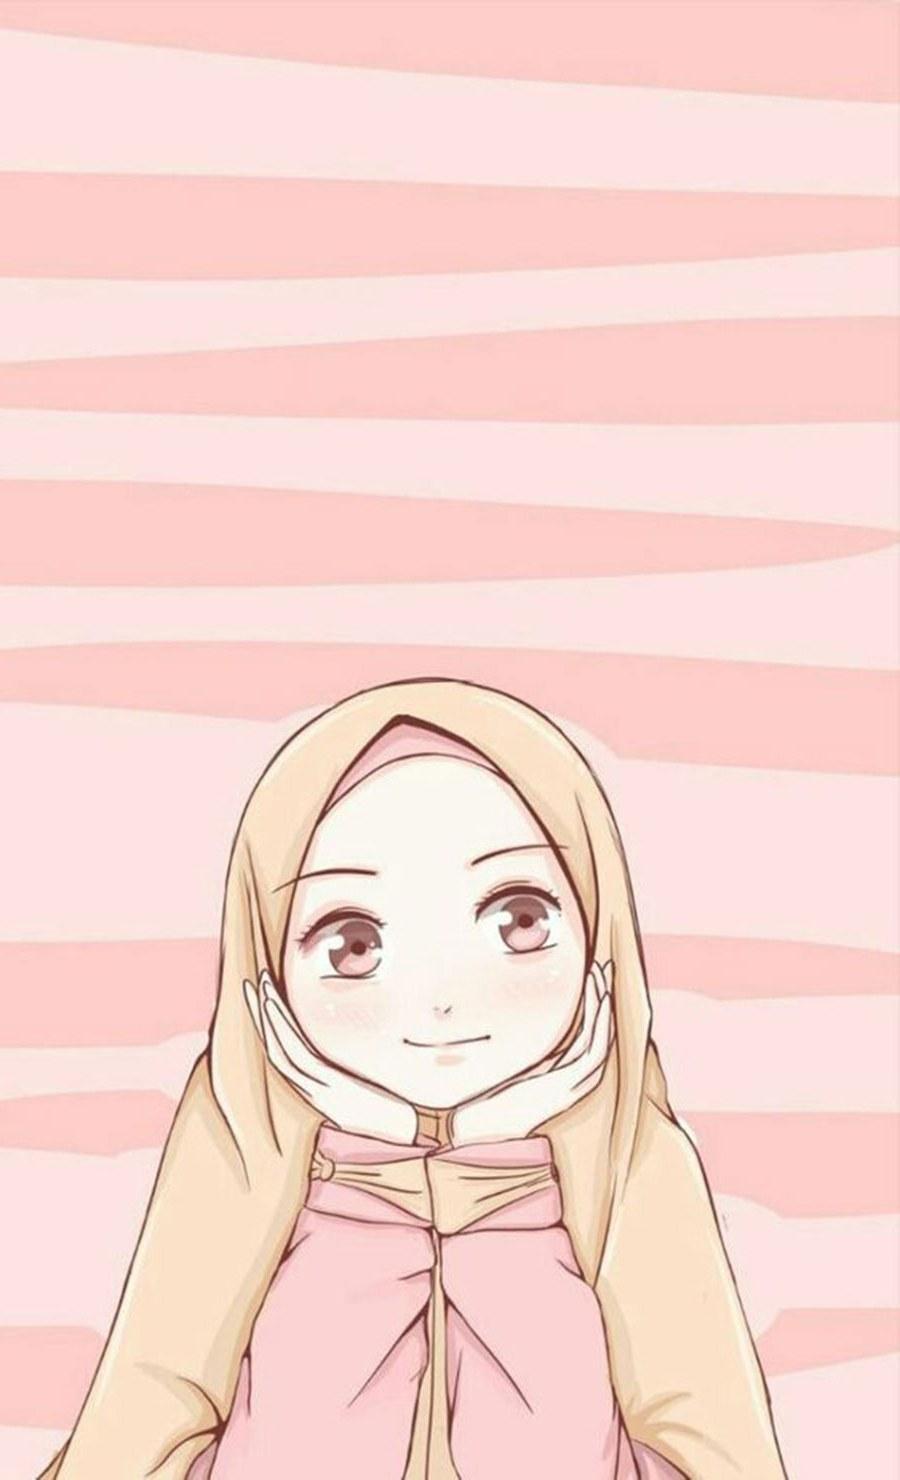 Design Muslimah Kartun Kvdd 1000 Gambar Kartun Muslimah Cantik Bercadar Kacamata El